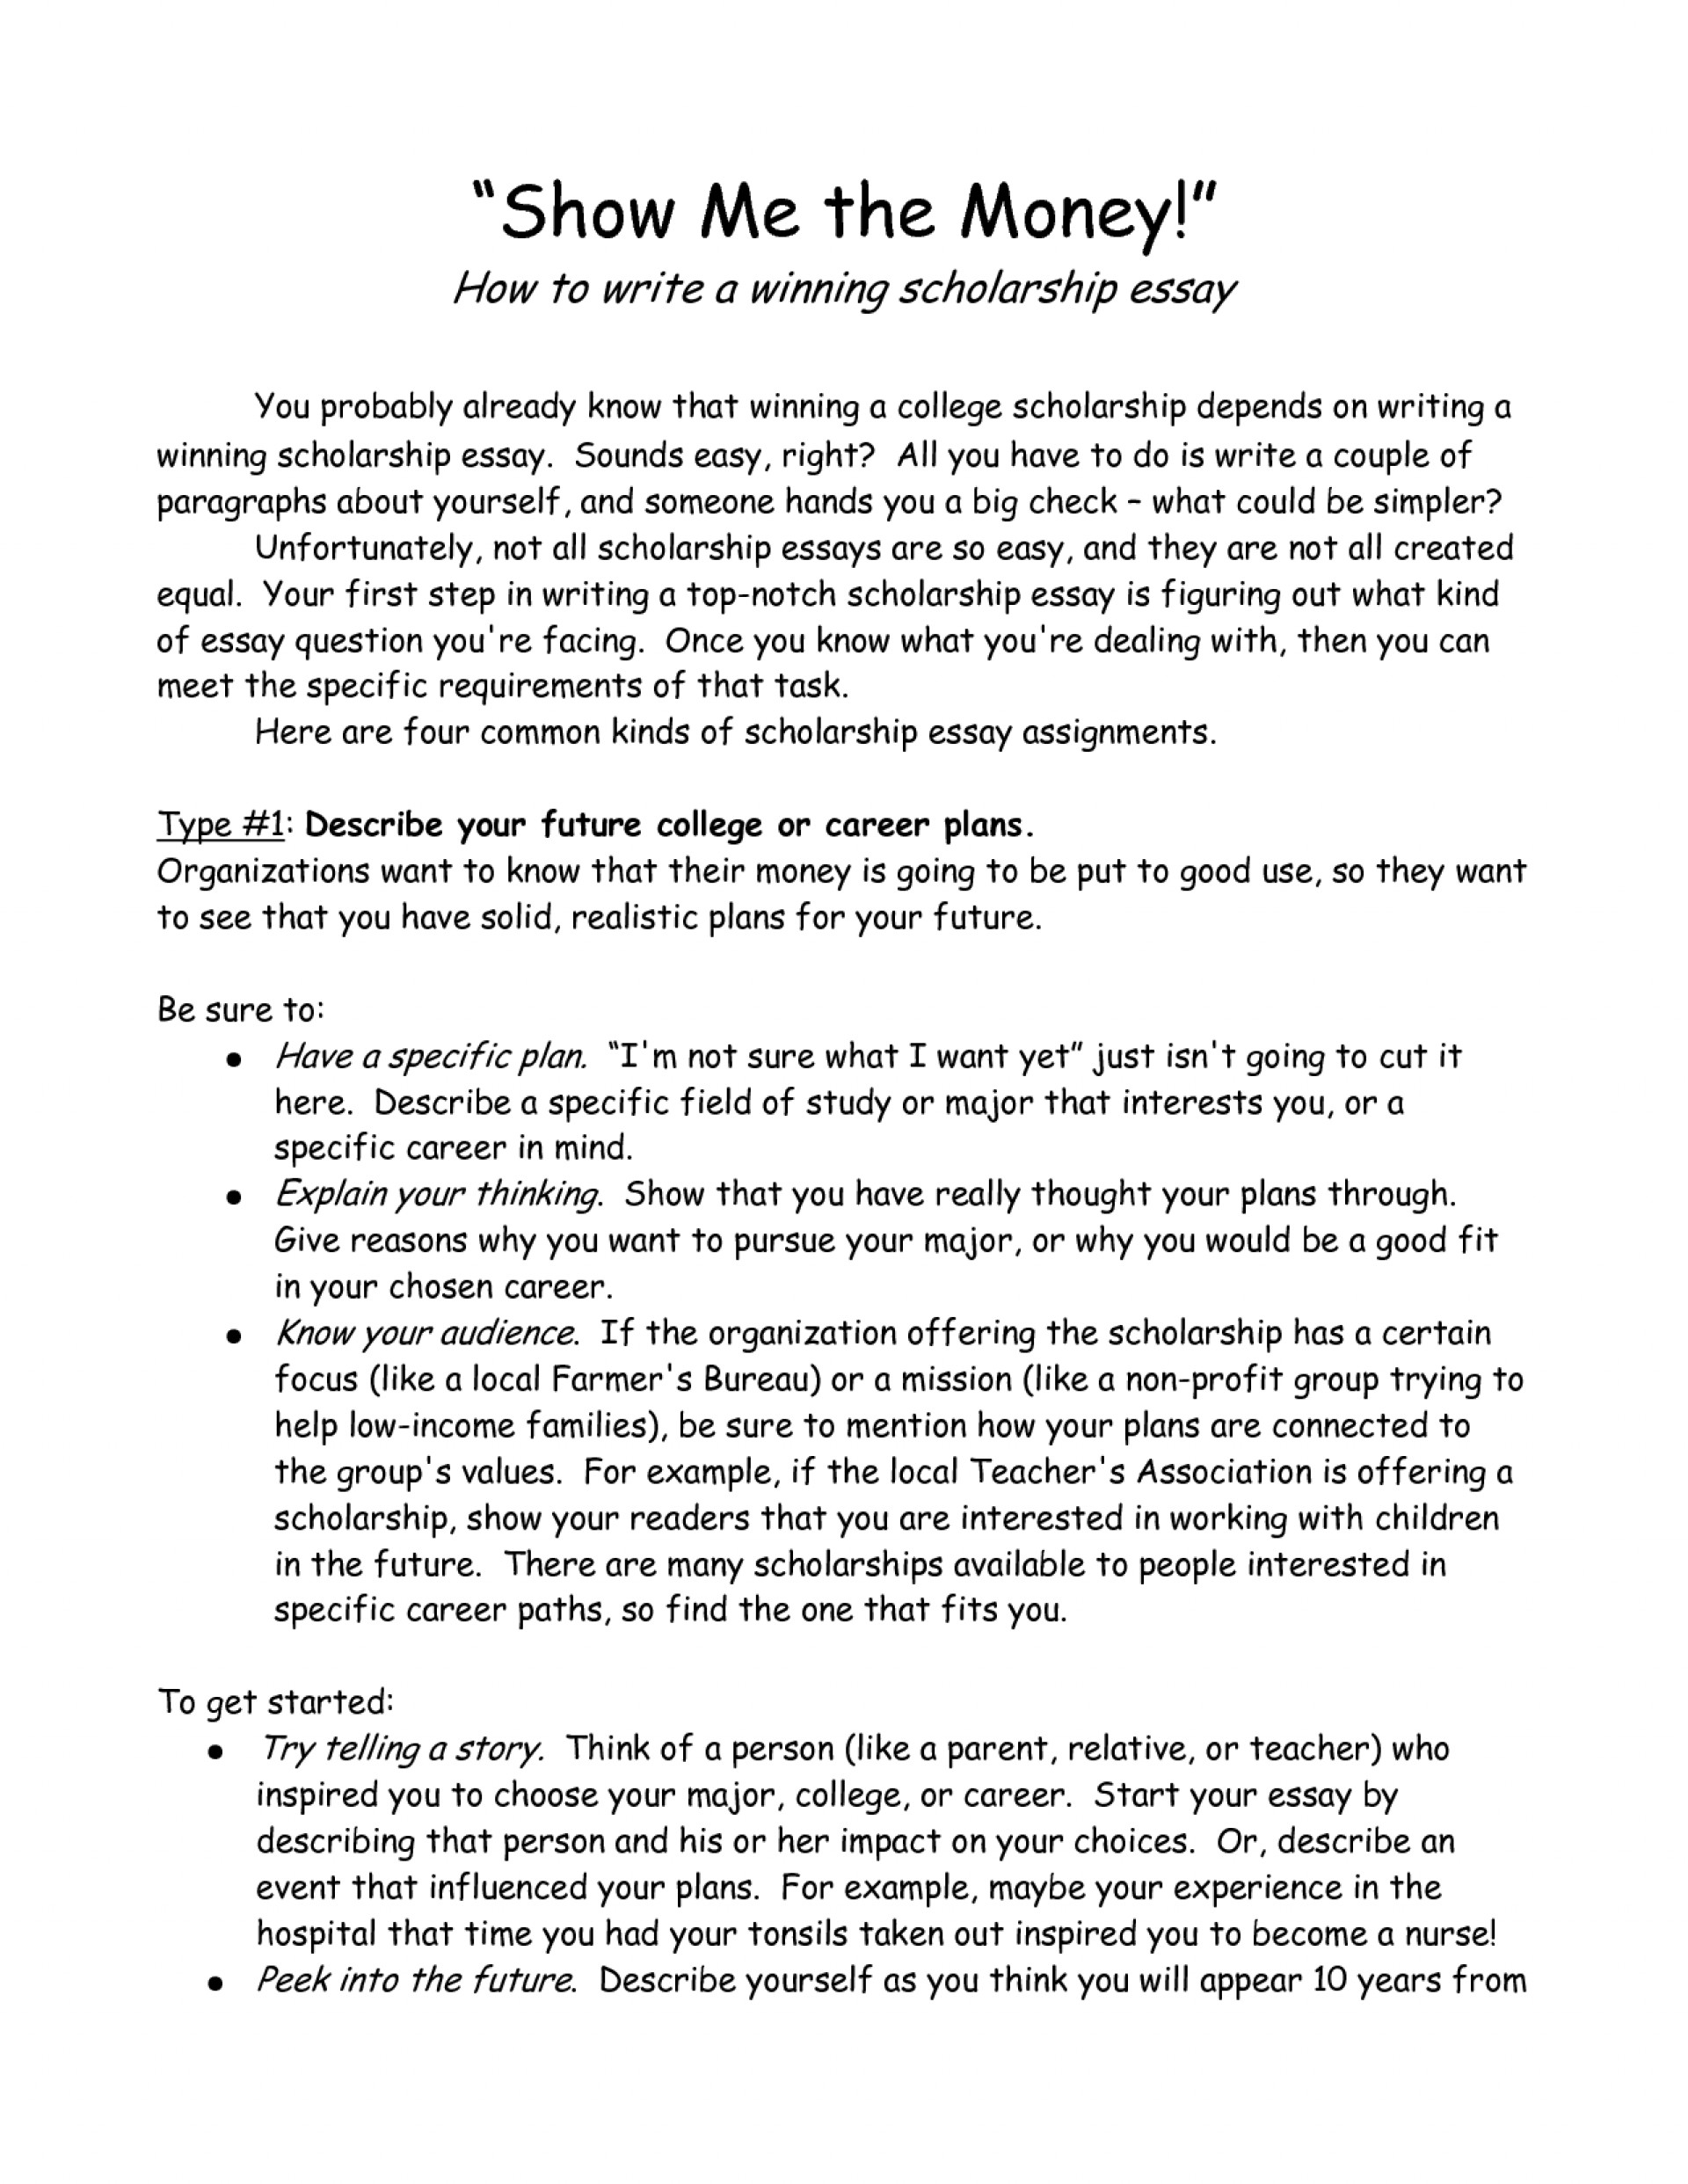 003 Scholarship Essay Tips Example Singular Rotc Psc Reddit 1920